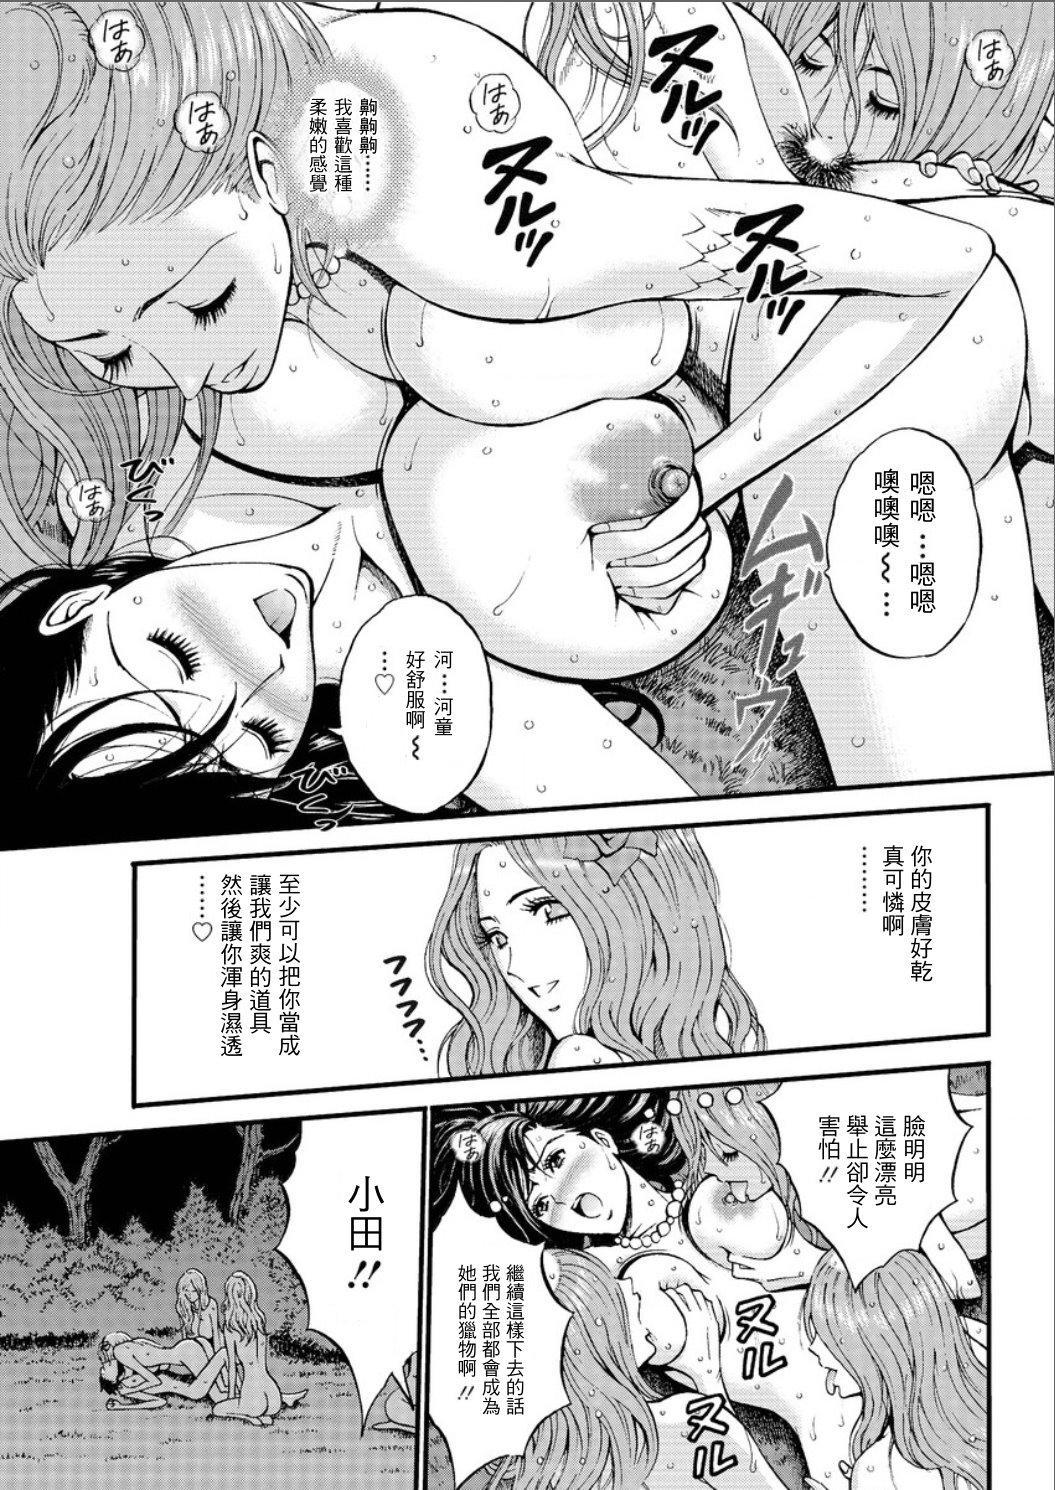 Kigenzen 10000 Nen no Ota | 史前一萬年的宅男 Ch. 19-24 32